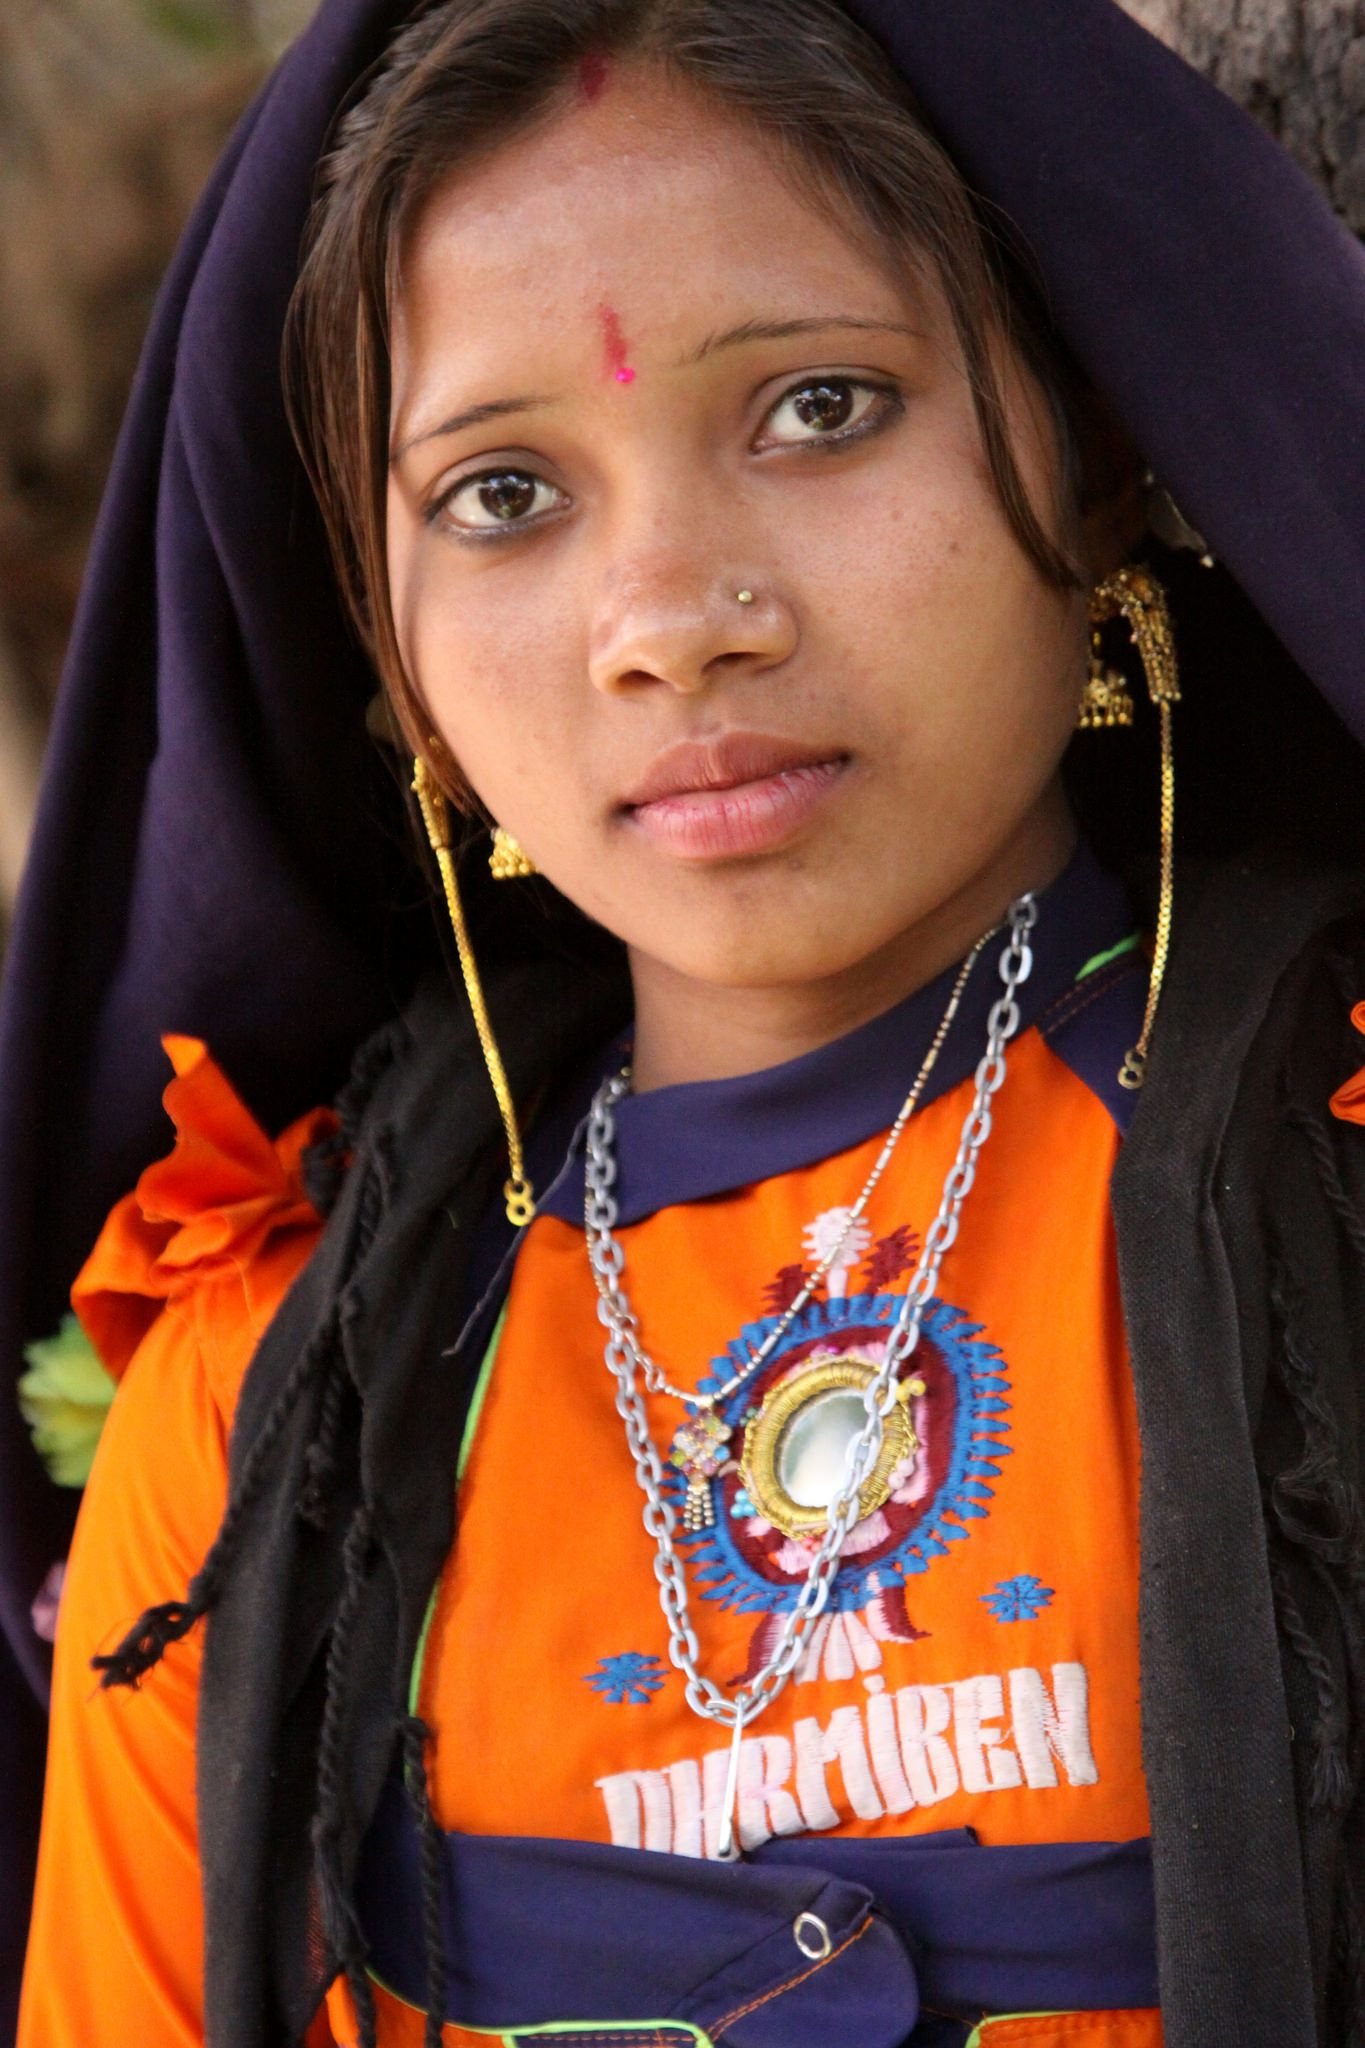 https://flic.kr/p/DdnARg | india - a view of gujarat | India - A view of Gujarat.